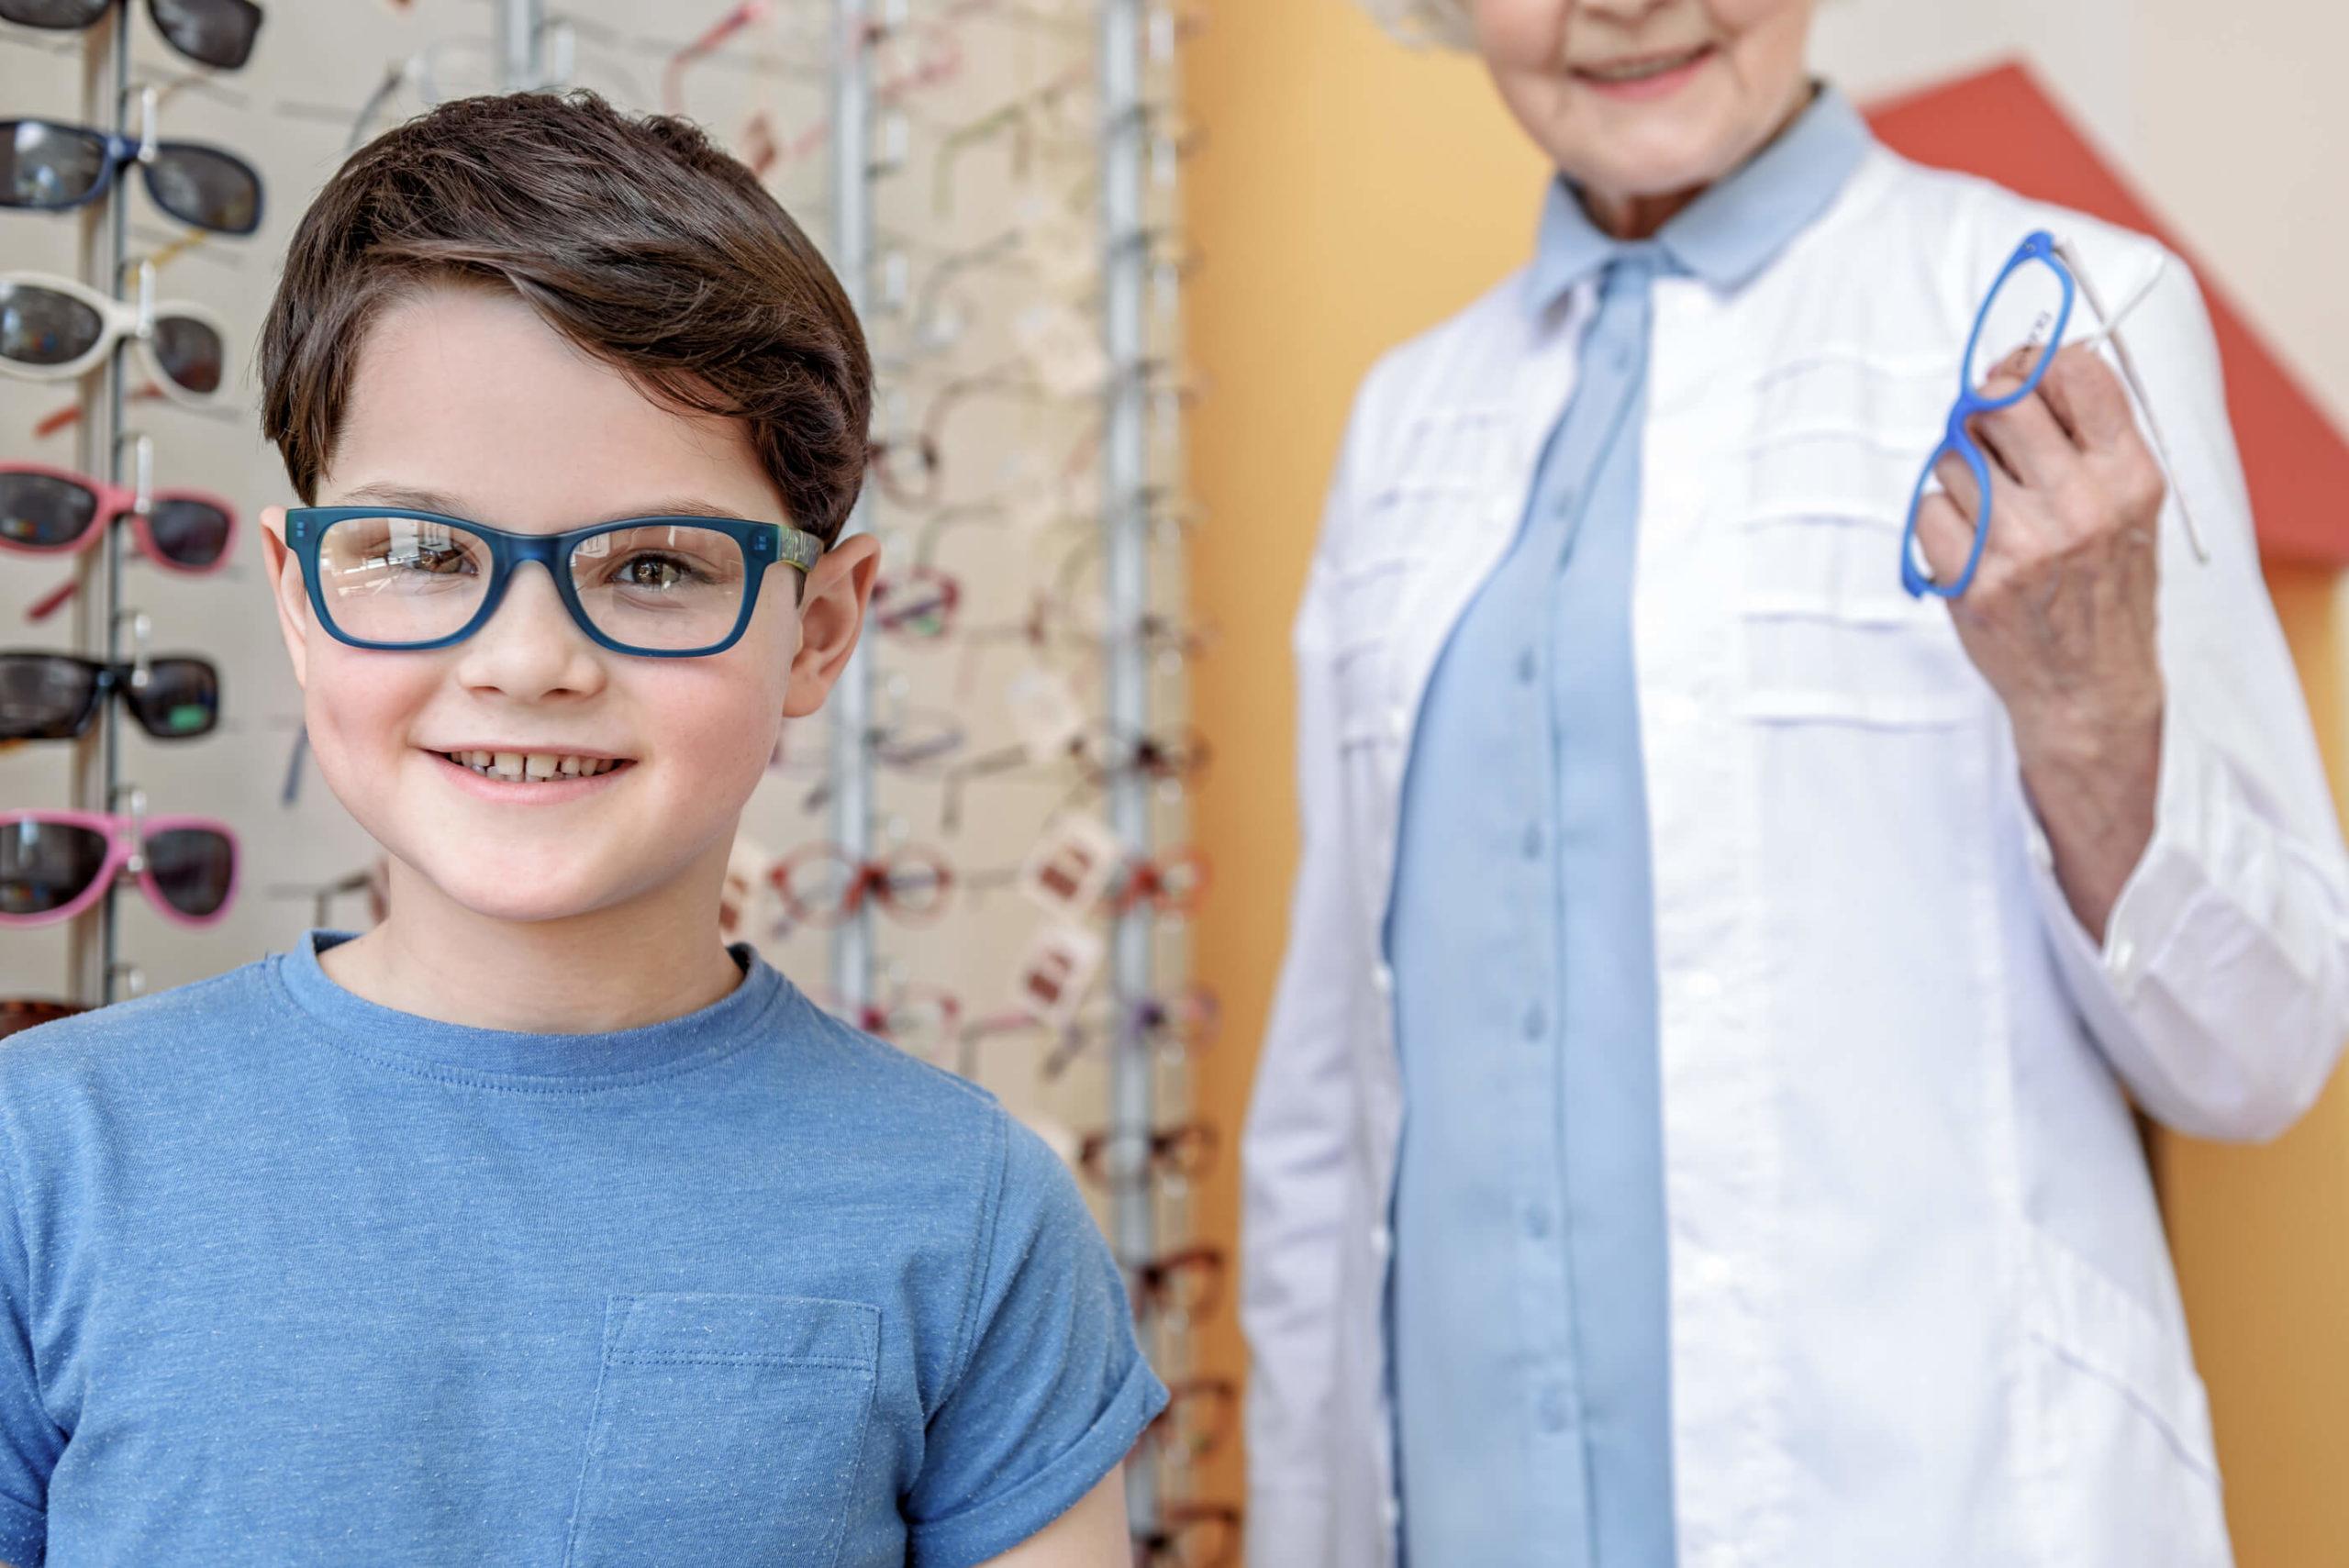 interior Illinois Vision Screening and Exam Mandates for Children banner image